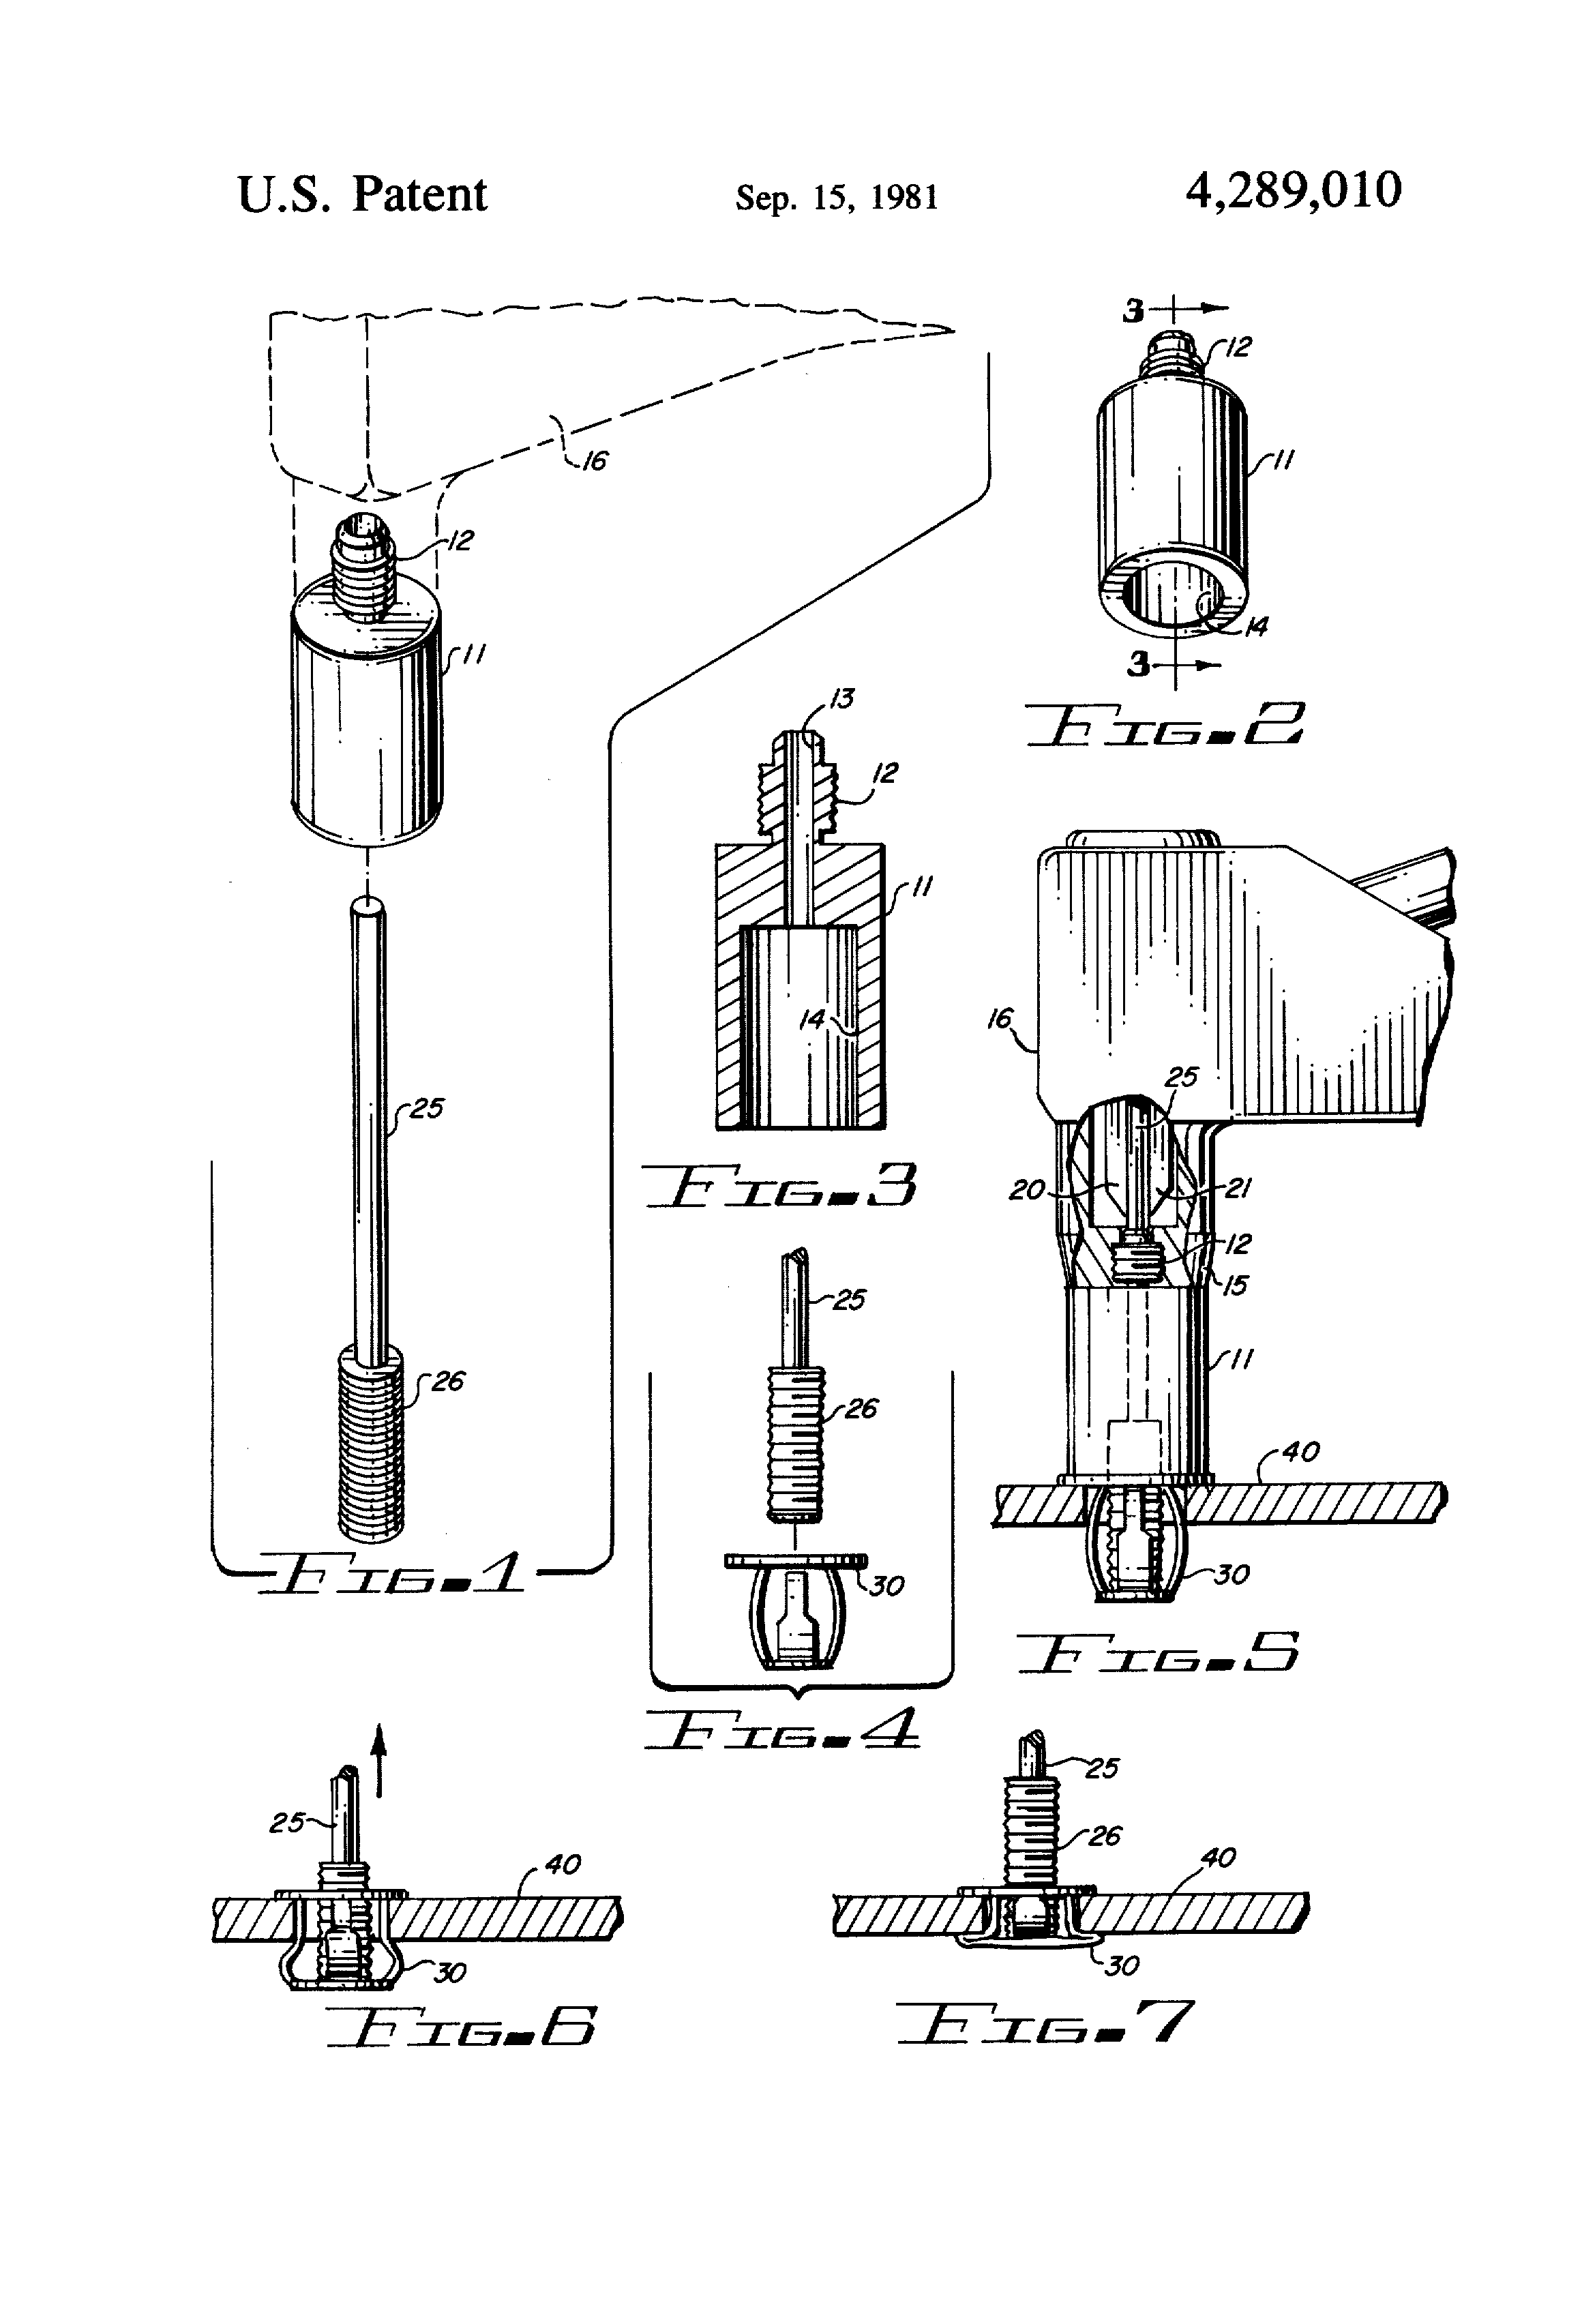 harp parts diagram free